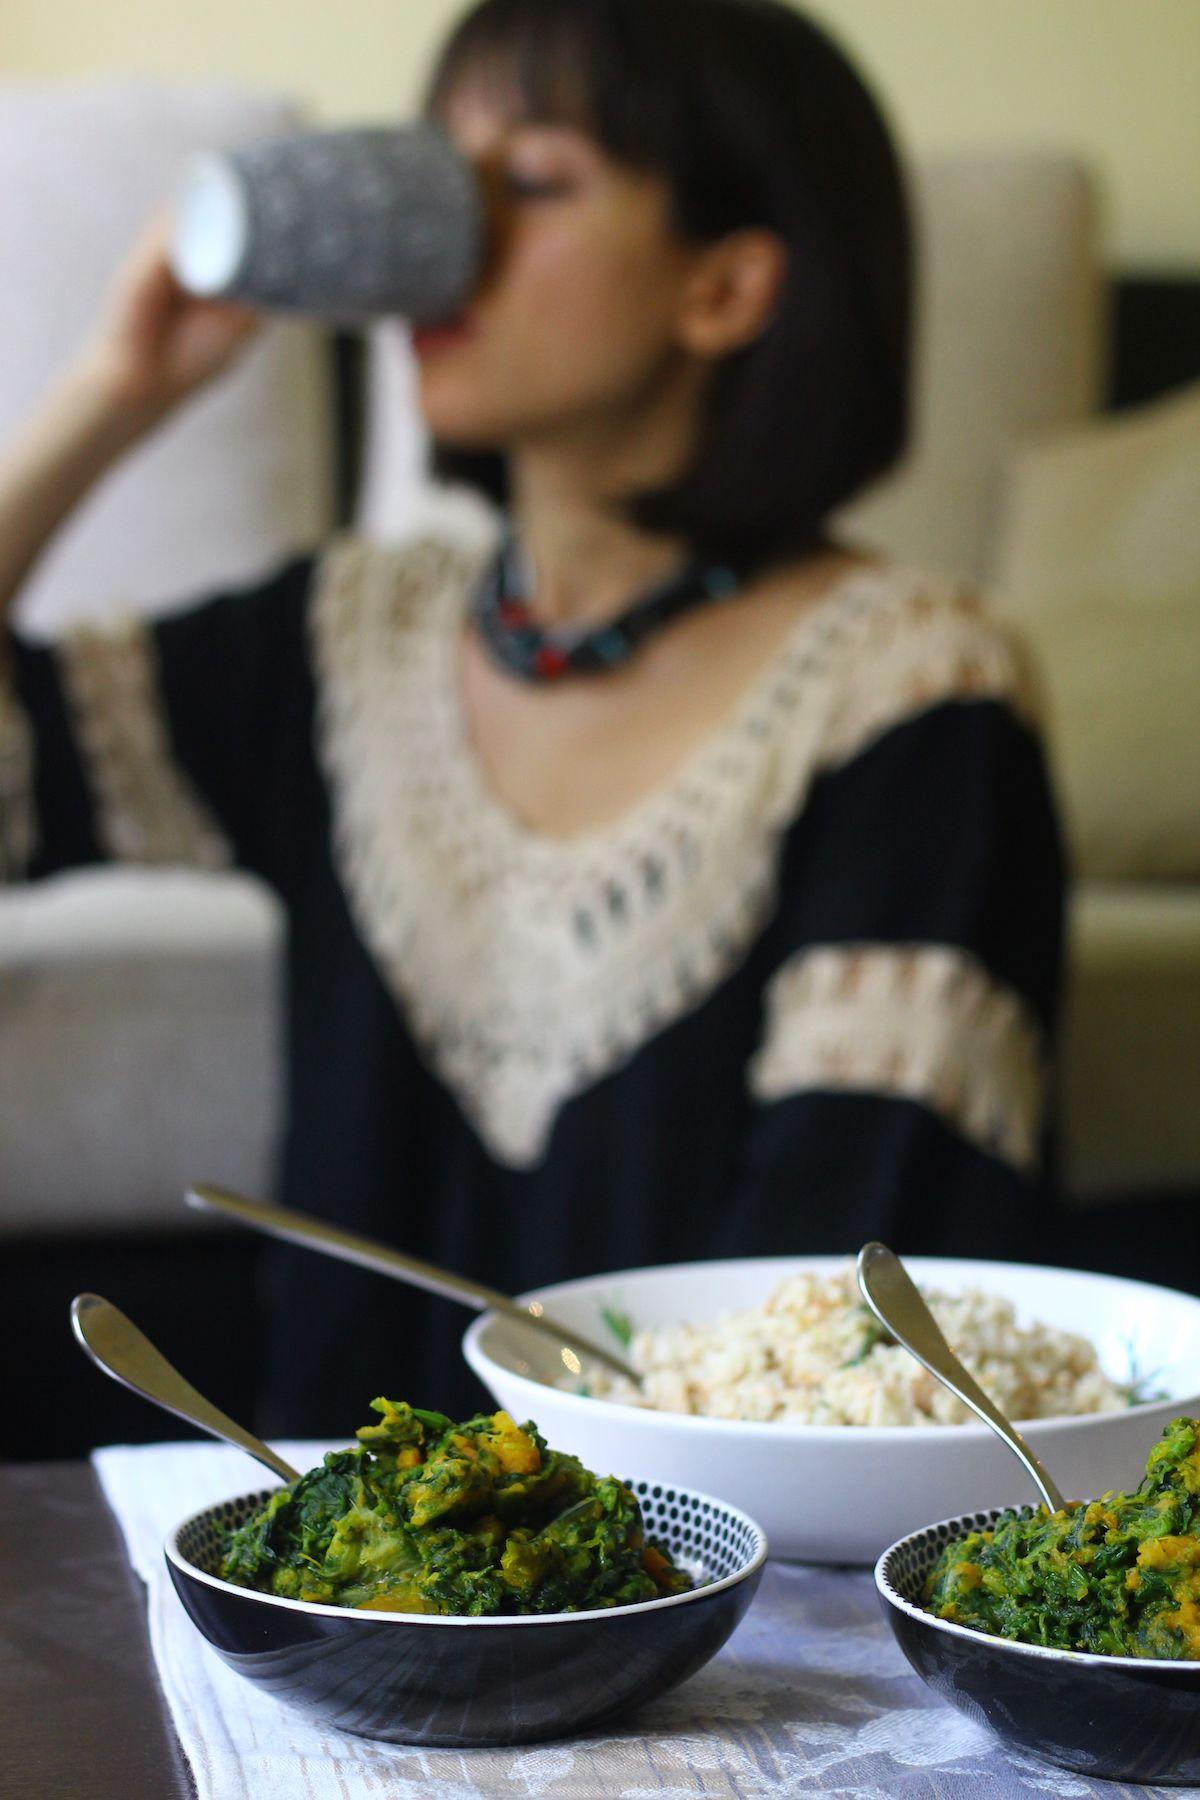 #grainfree #palep #cauliflowerrice #glutenfree #aip #autoimmunepaleo #autoimmuneprotocol